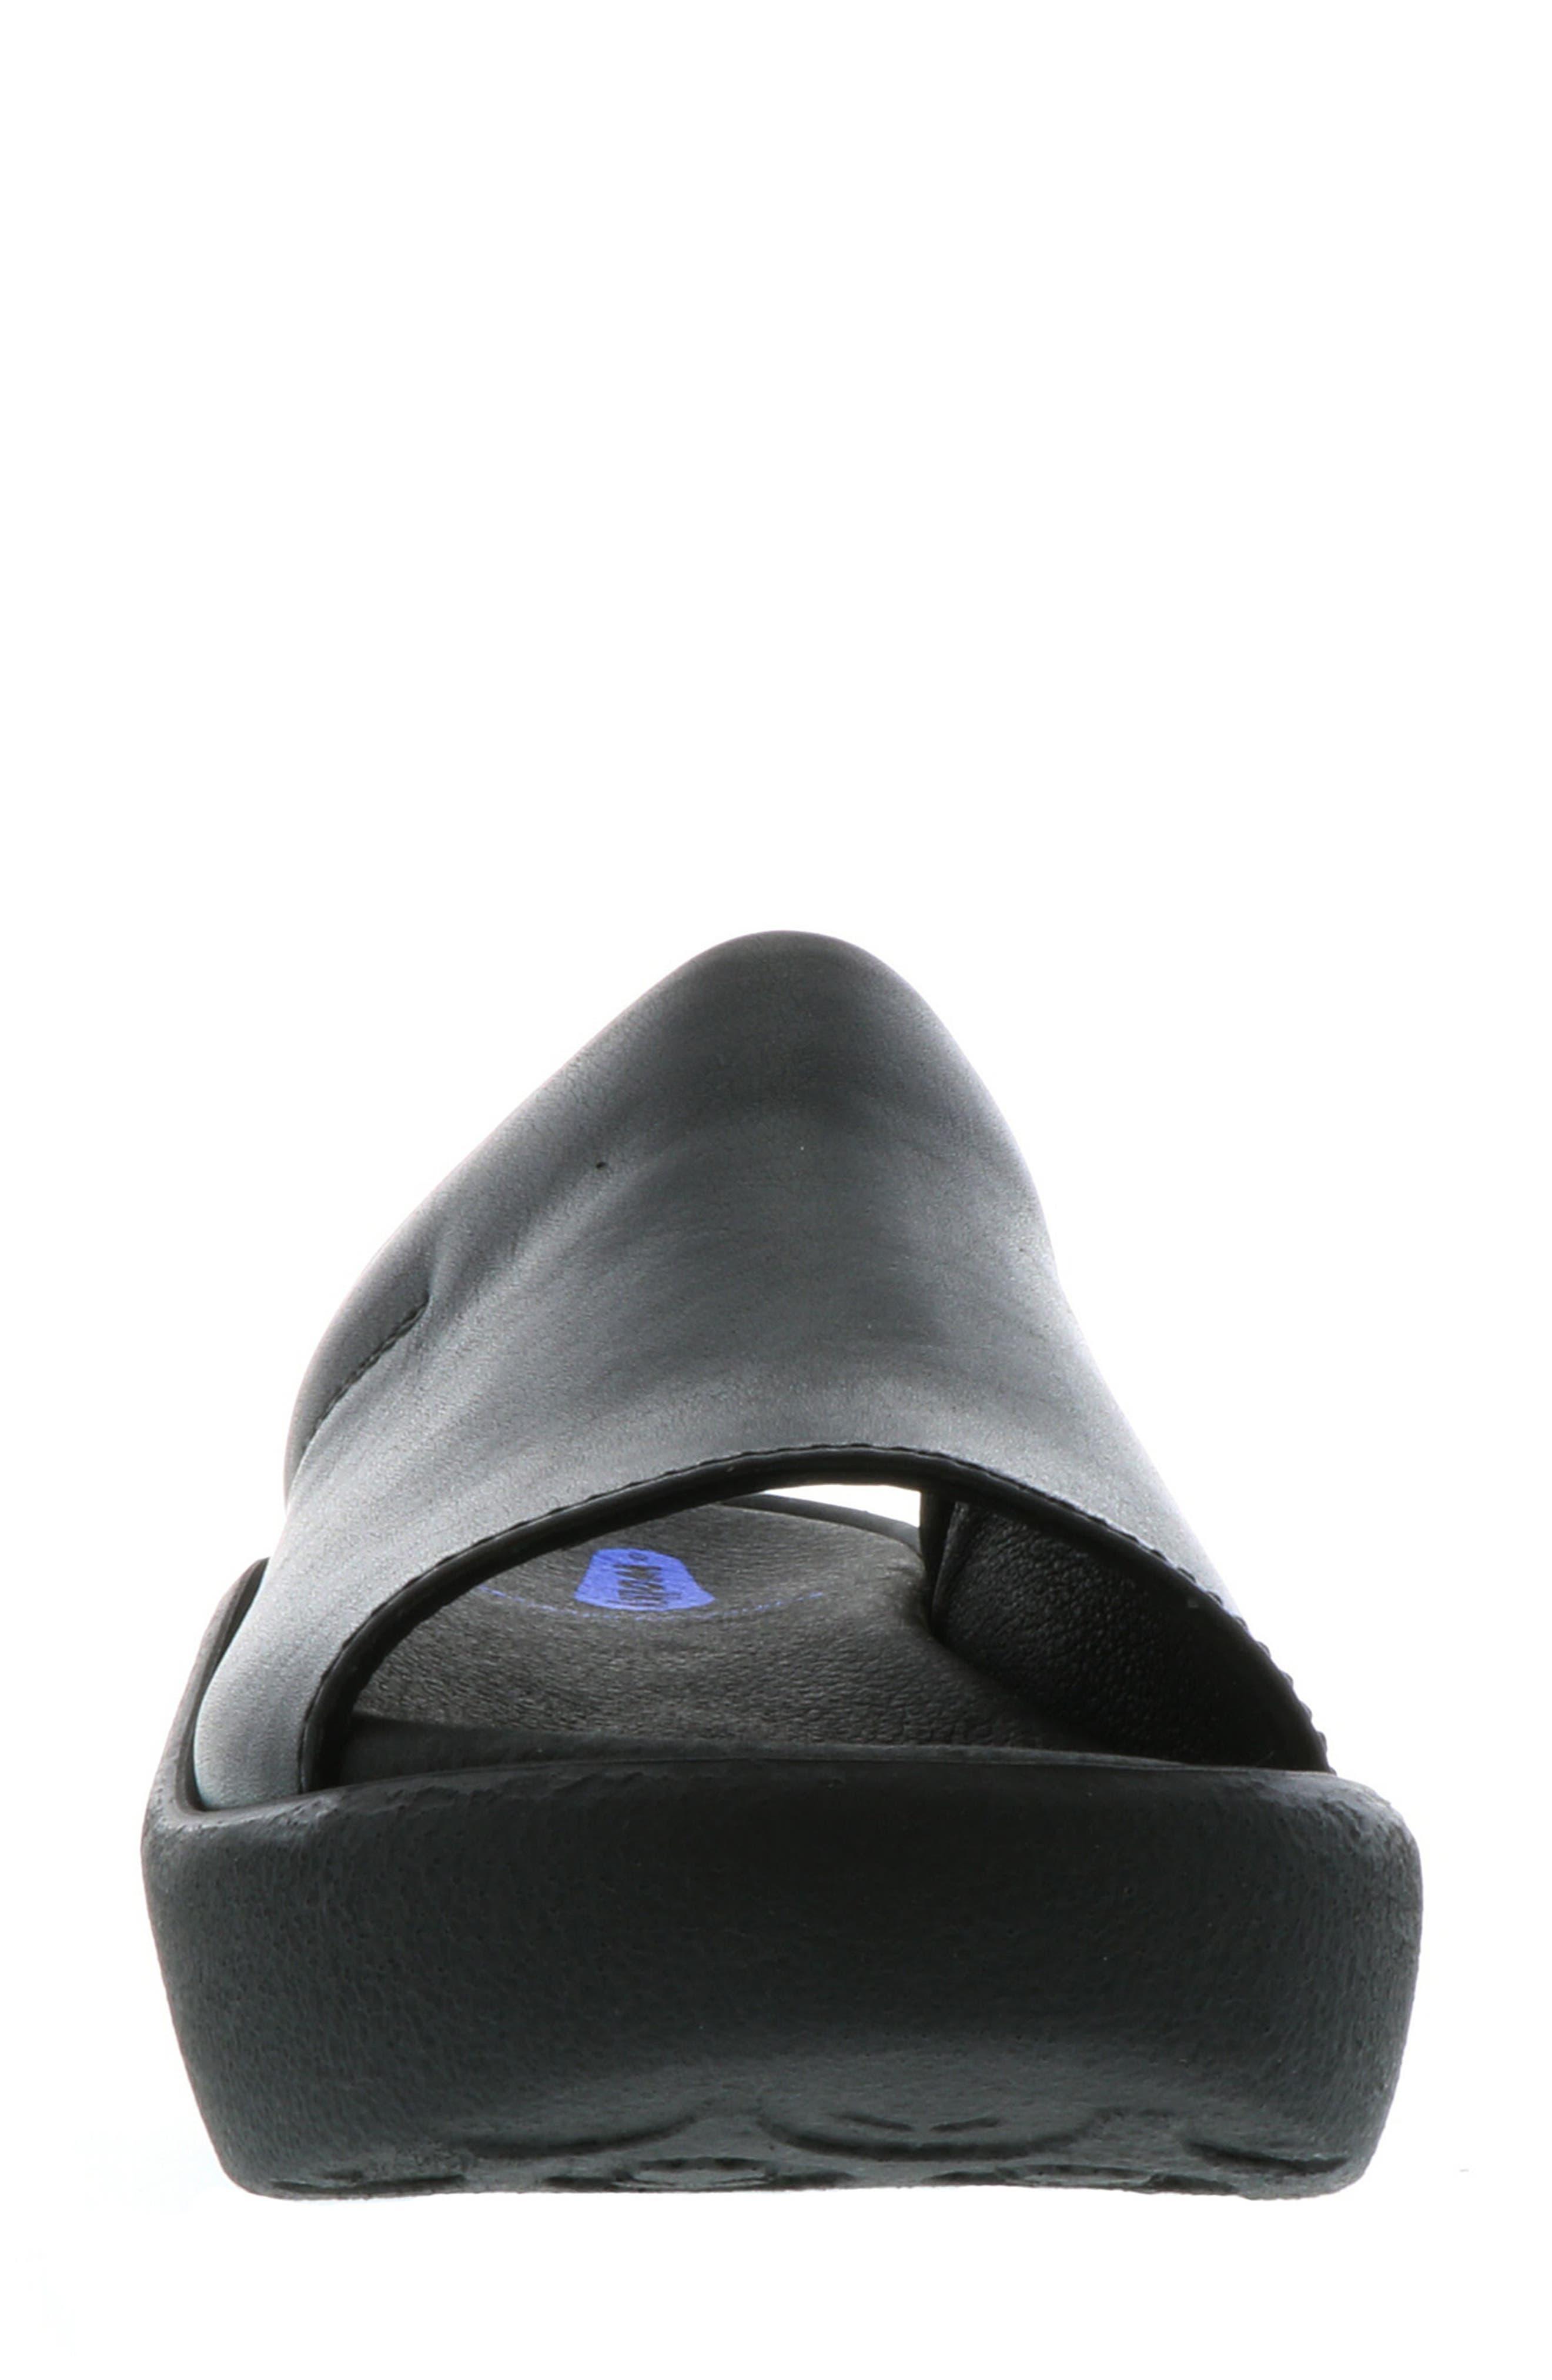 Nassau Slide Sandal,                             Alternate thumbnail 4, color,                             BLACK SMOOTH LEATHER